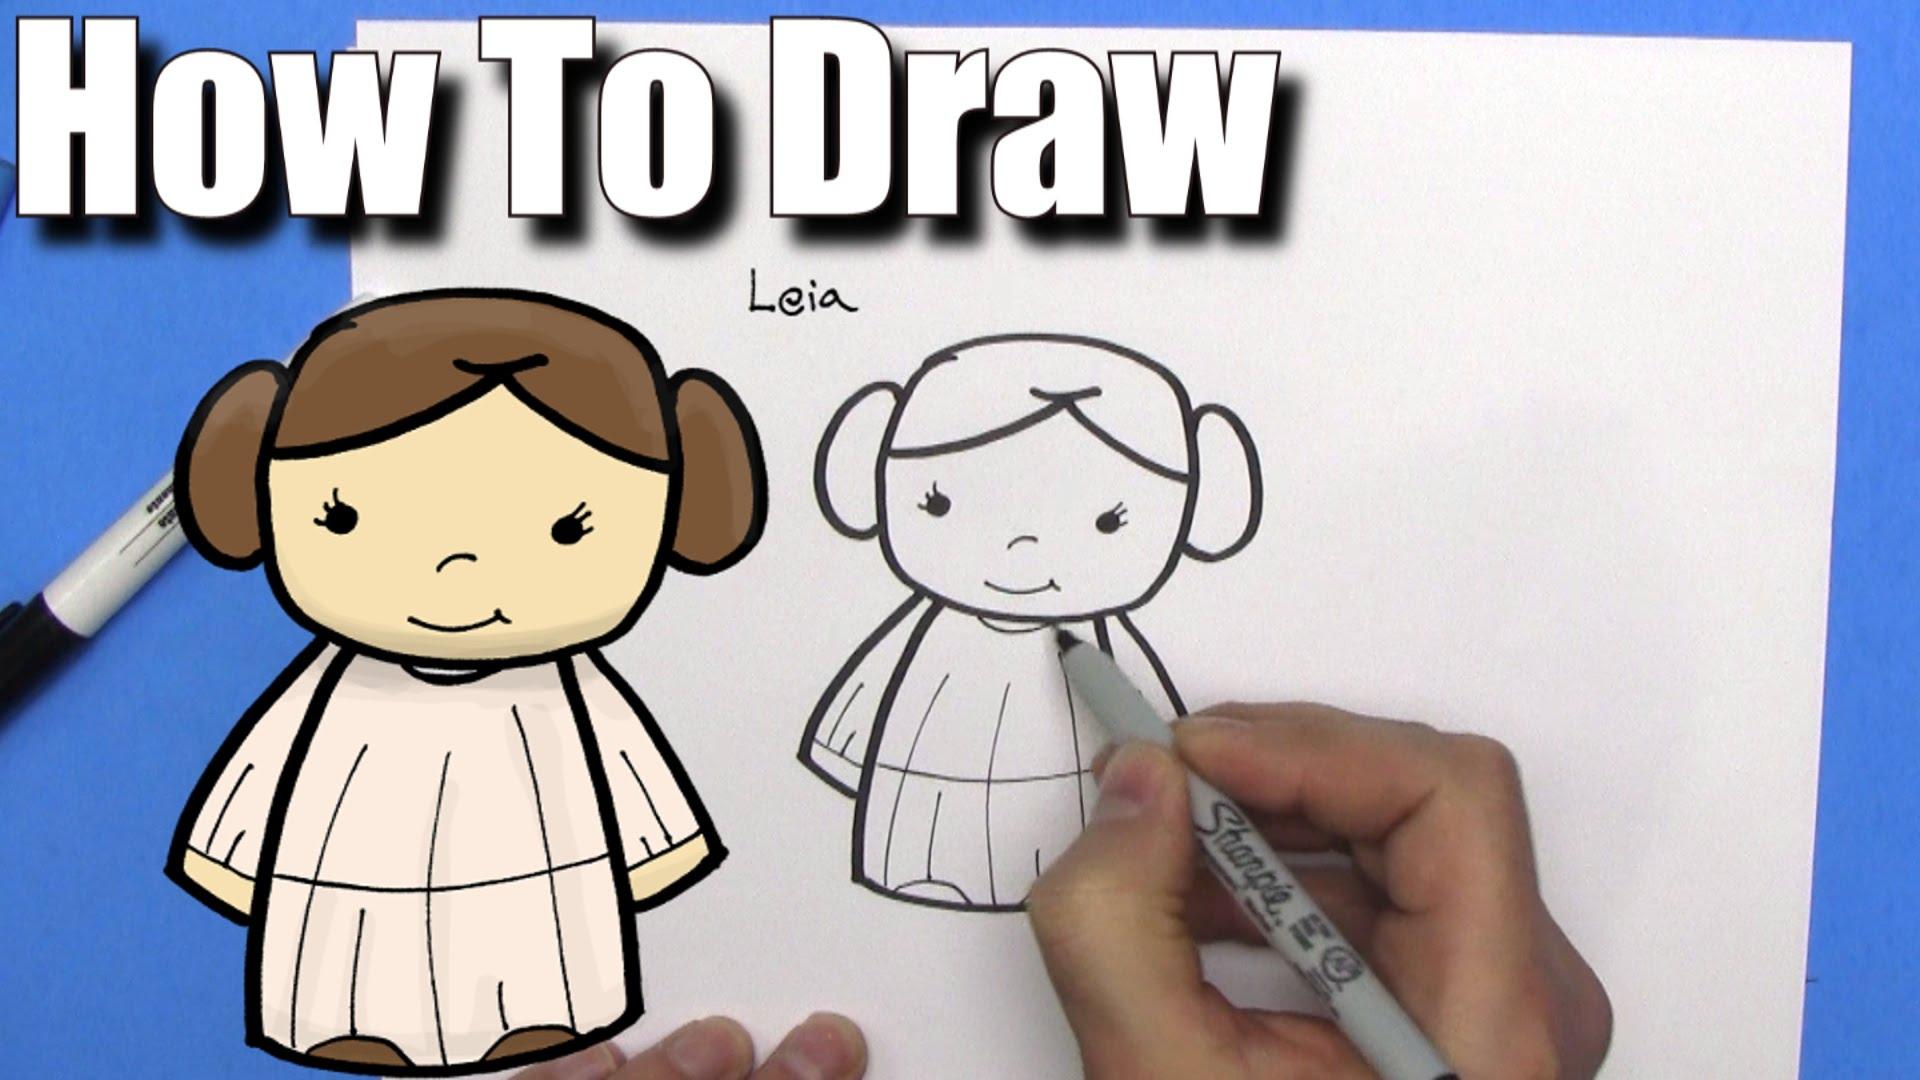 1920x1080 How To Draw Cute Cartoon Princess Leia